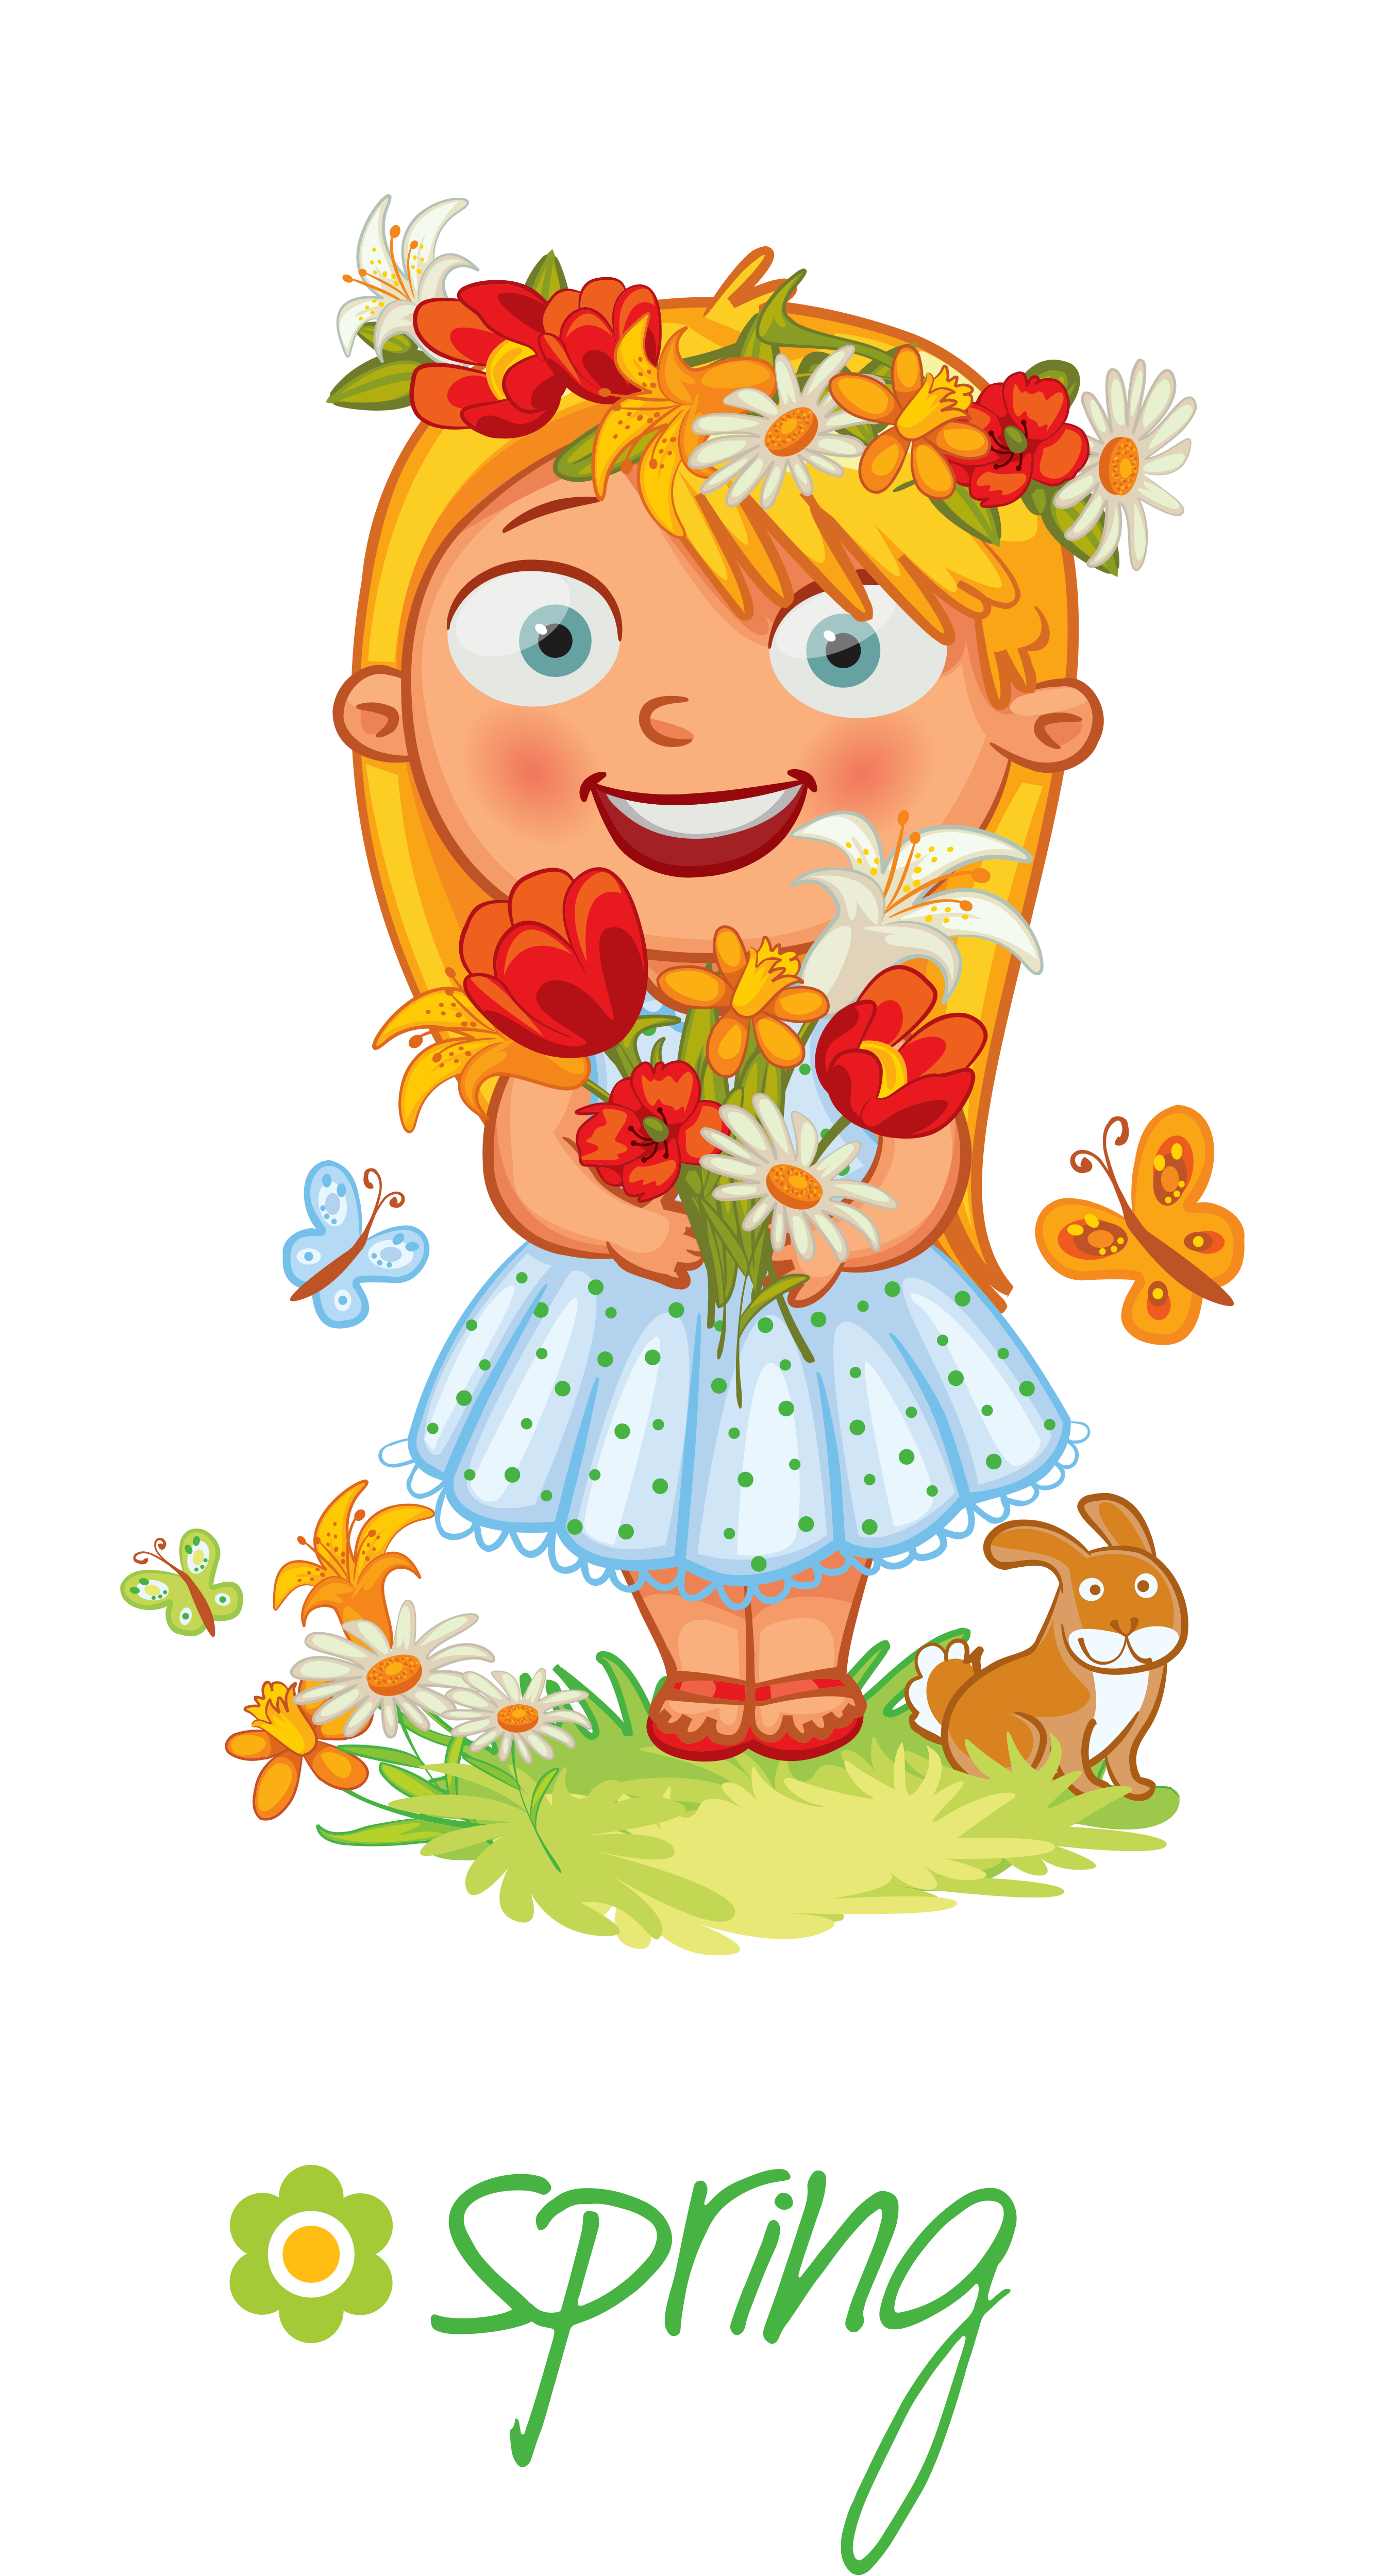 0_fa942_c4428f3f_orig (2699×5000)   Clipart cute   Pinterest